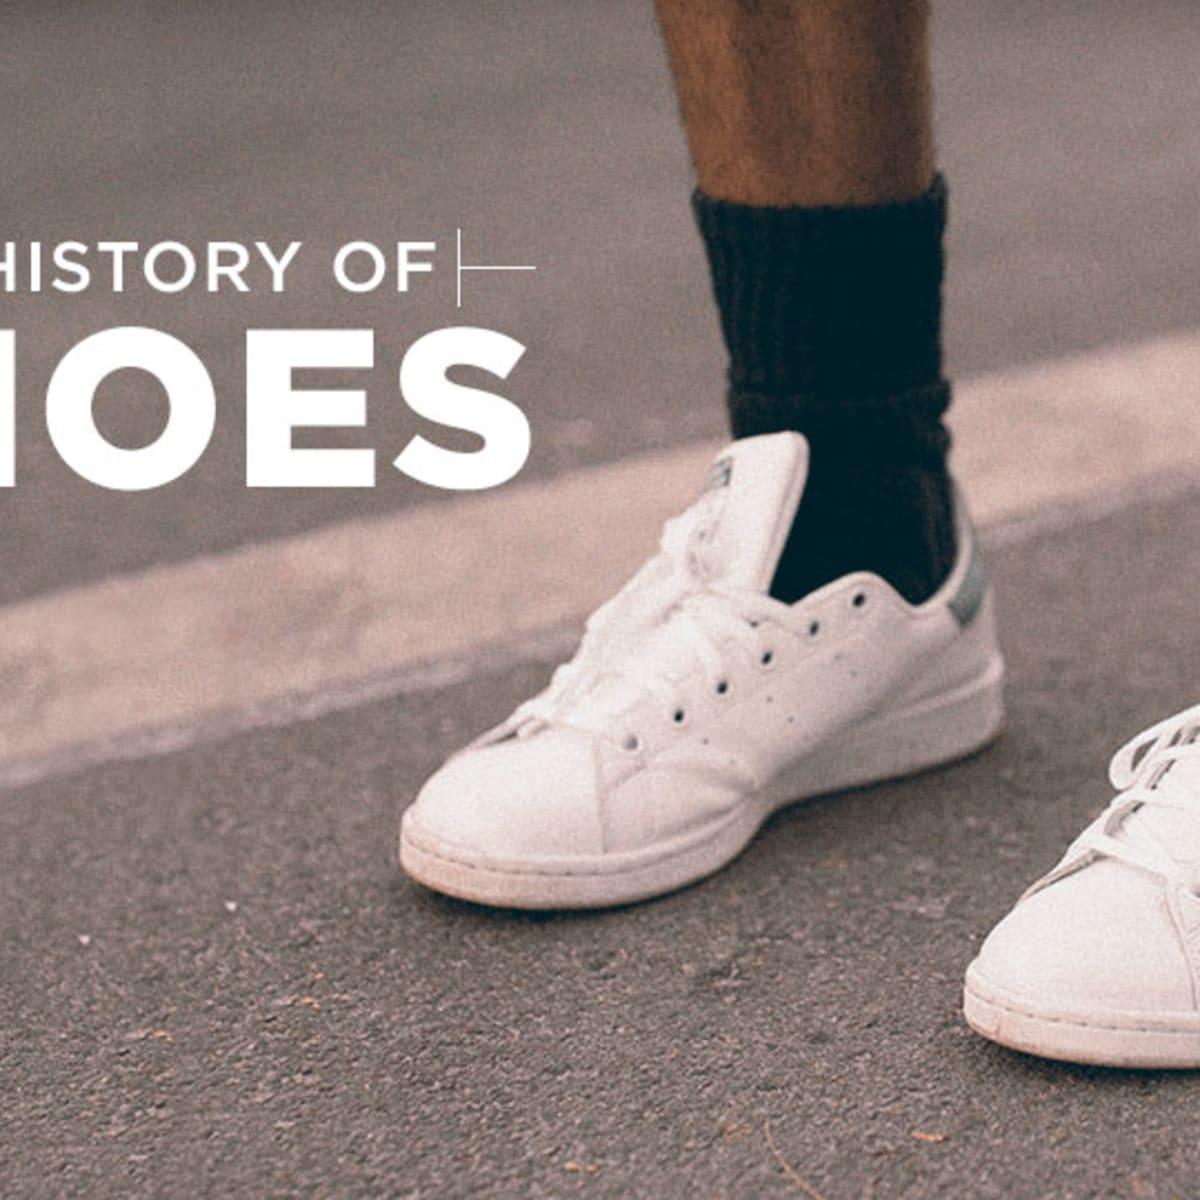 tennis shoes: Adidas Stan Smith